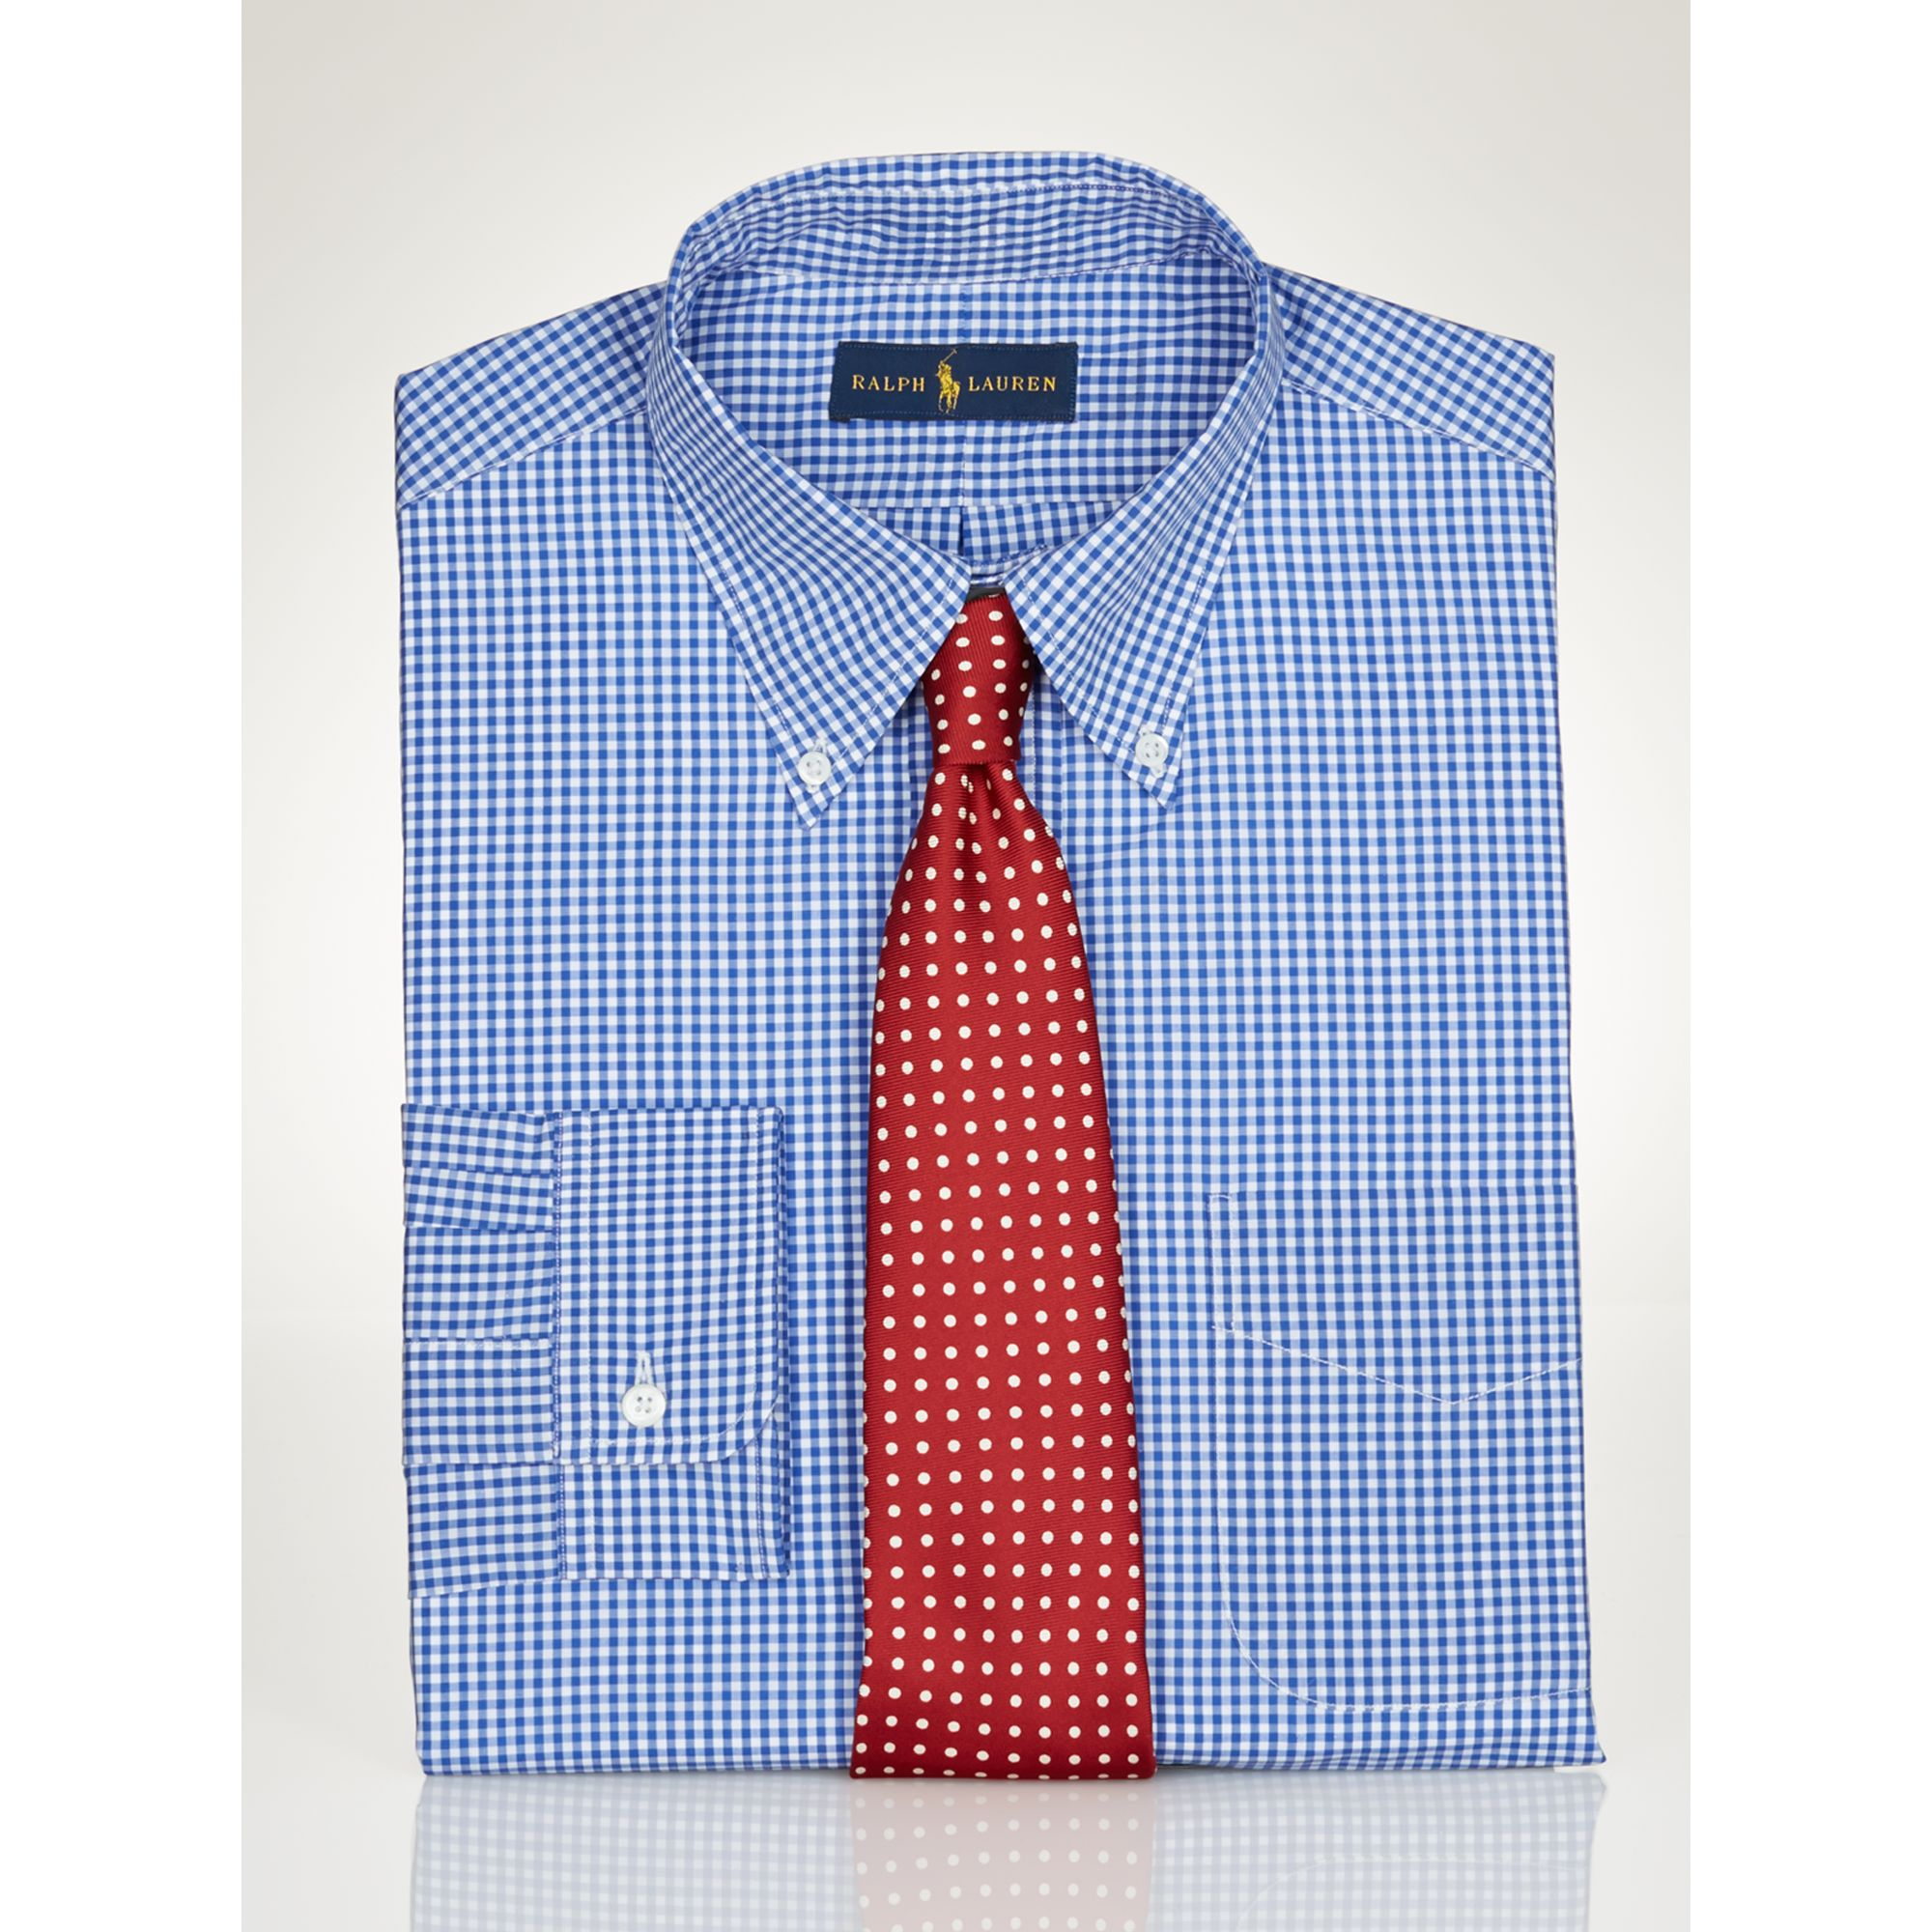 Lyst Polo Ralph Lauren Slim Fit Gingham Dress Shirt In